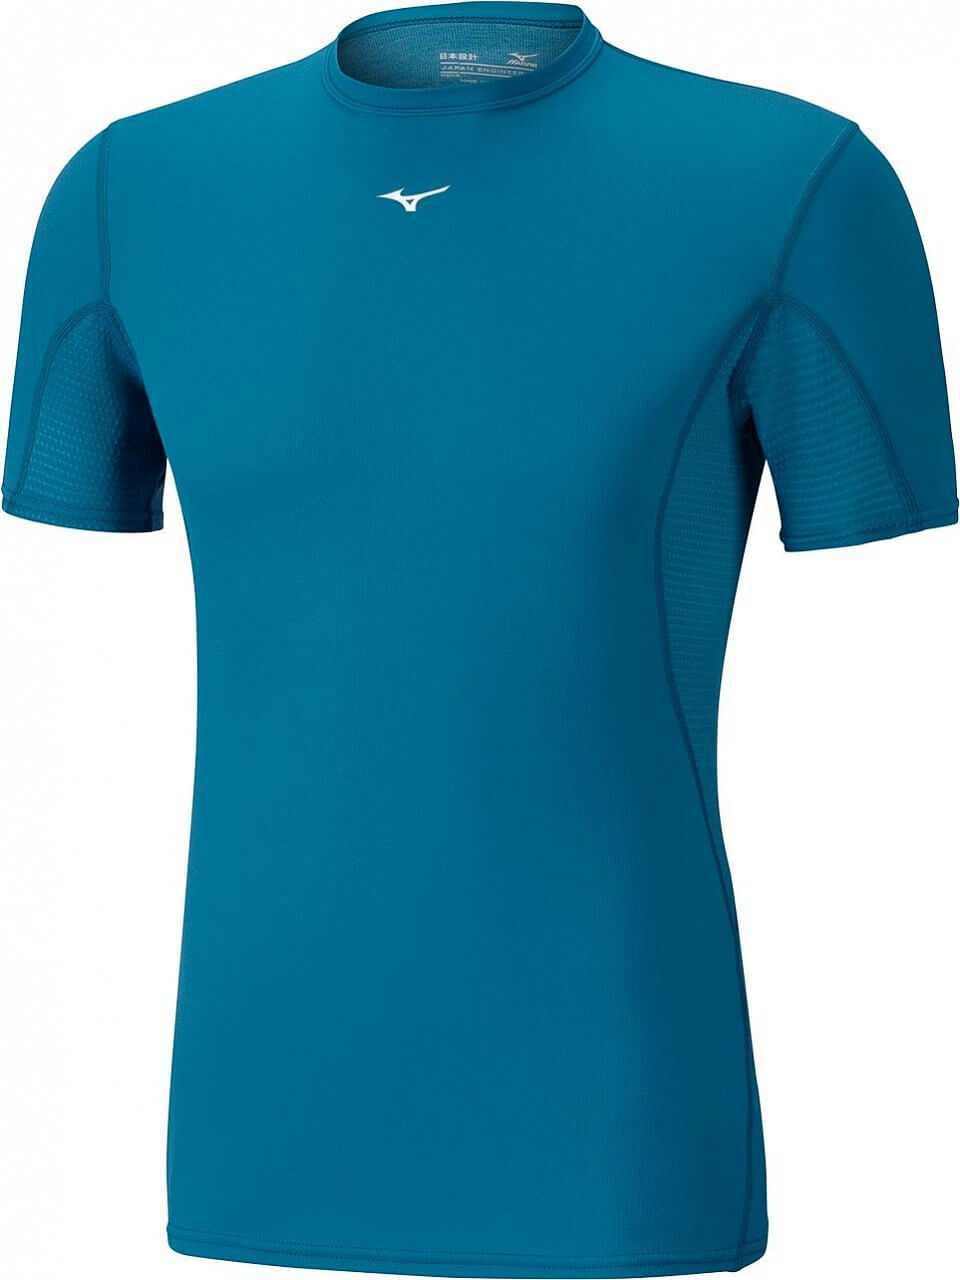 Pánské sportovní tričko Mizuno Mid Weight Tee